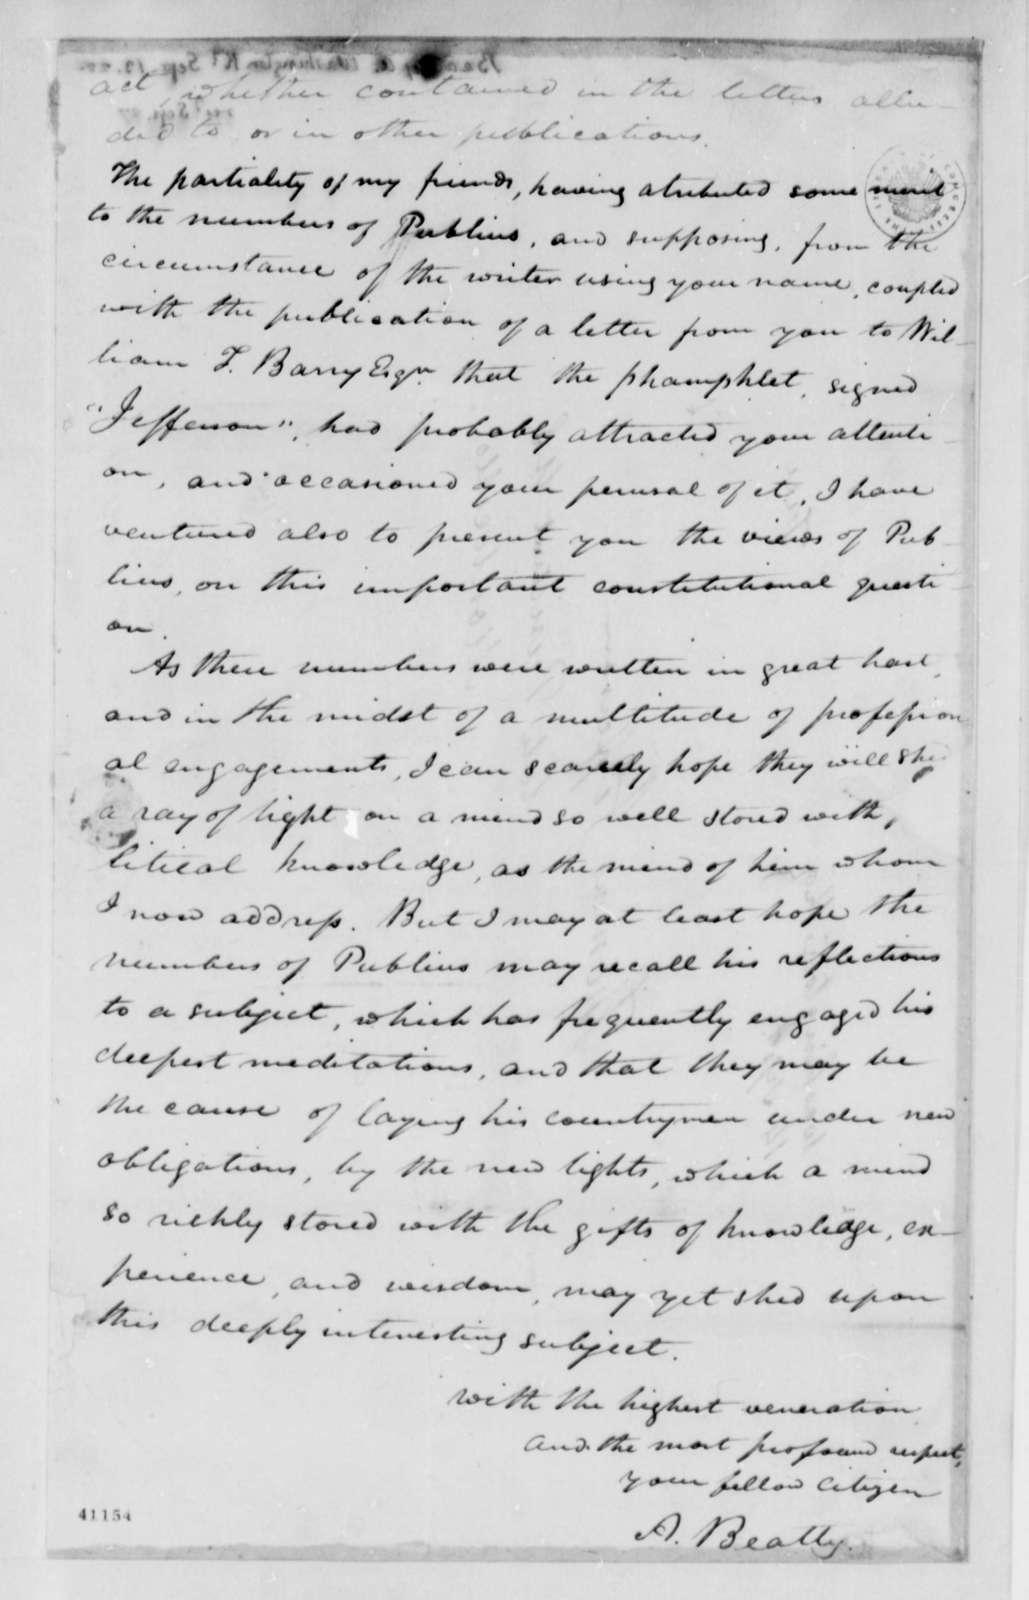 A. Beatty to Thomas Jefferson, September 13, 1825